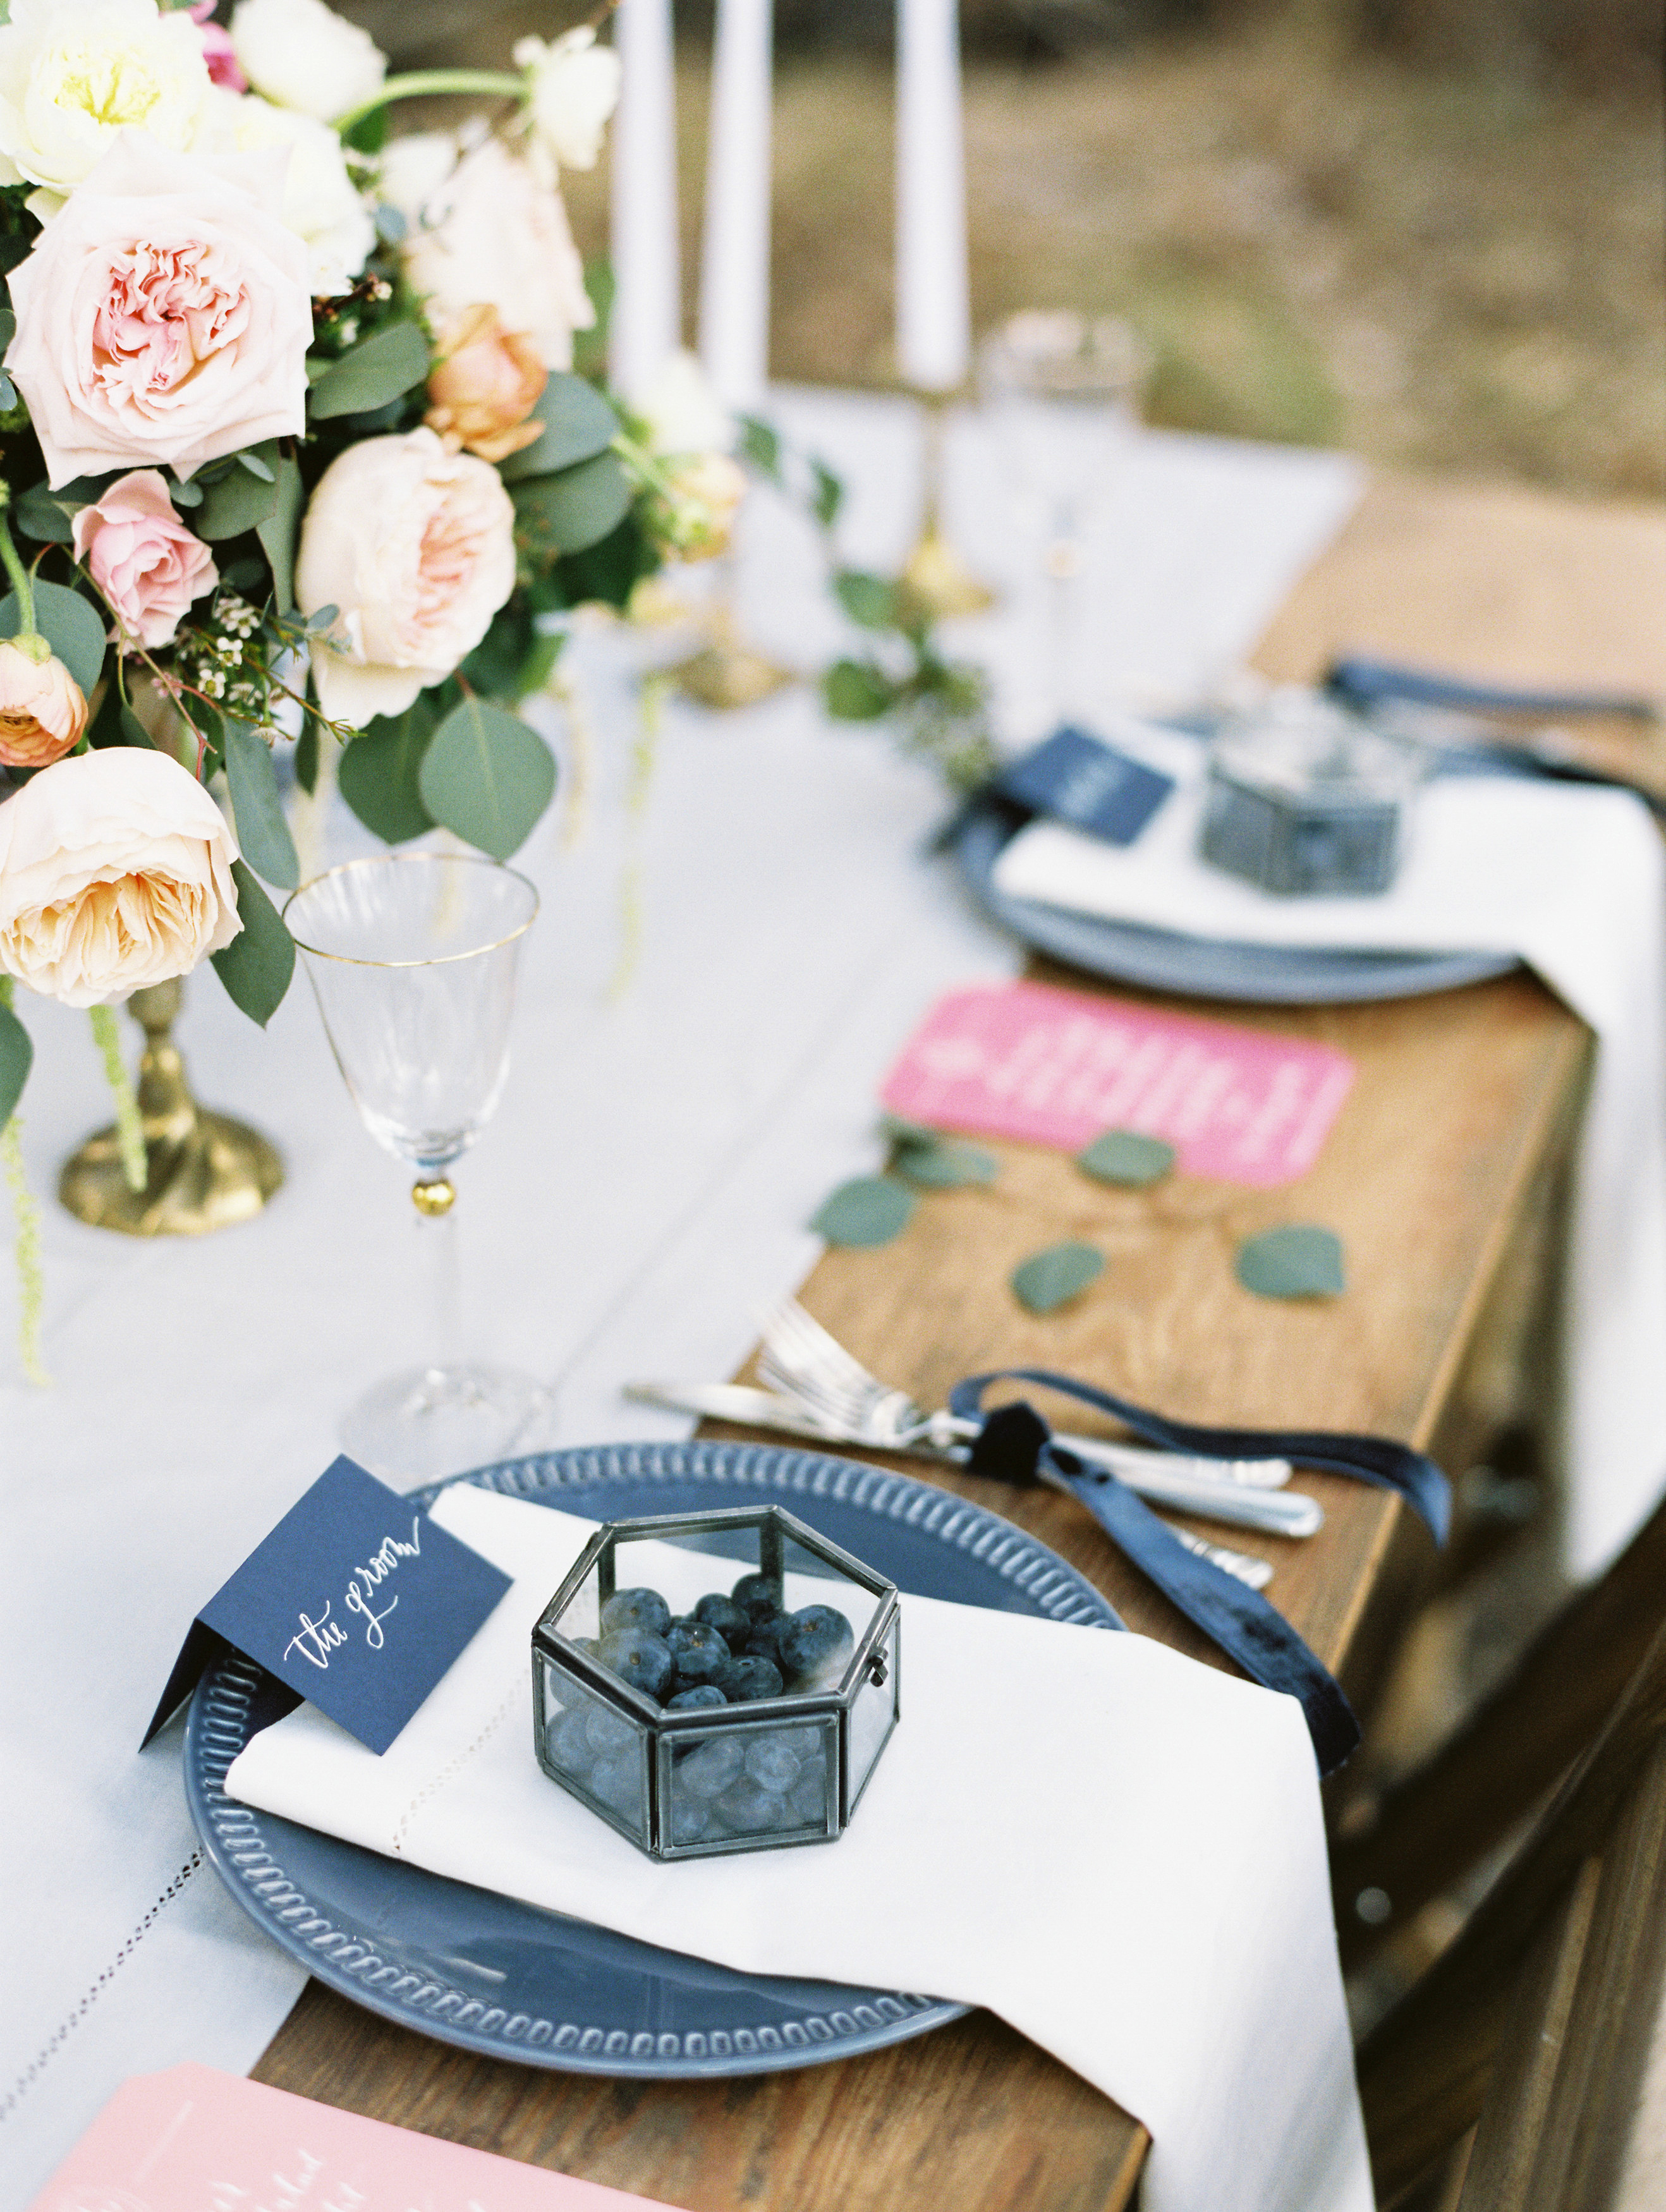 berry wedding ideas christie graham groom place setting